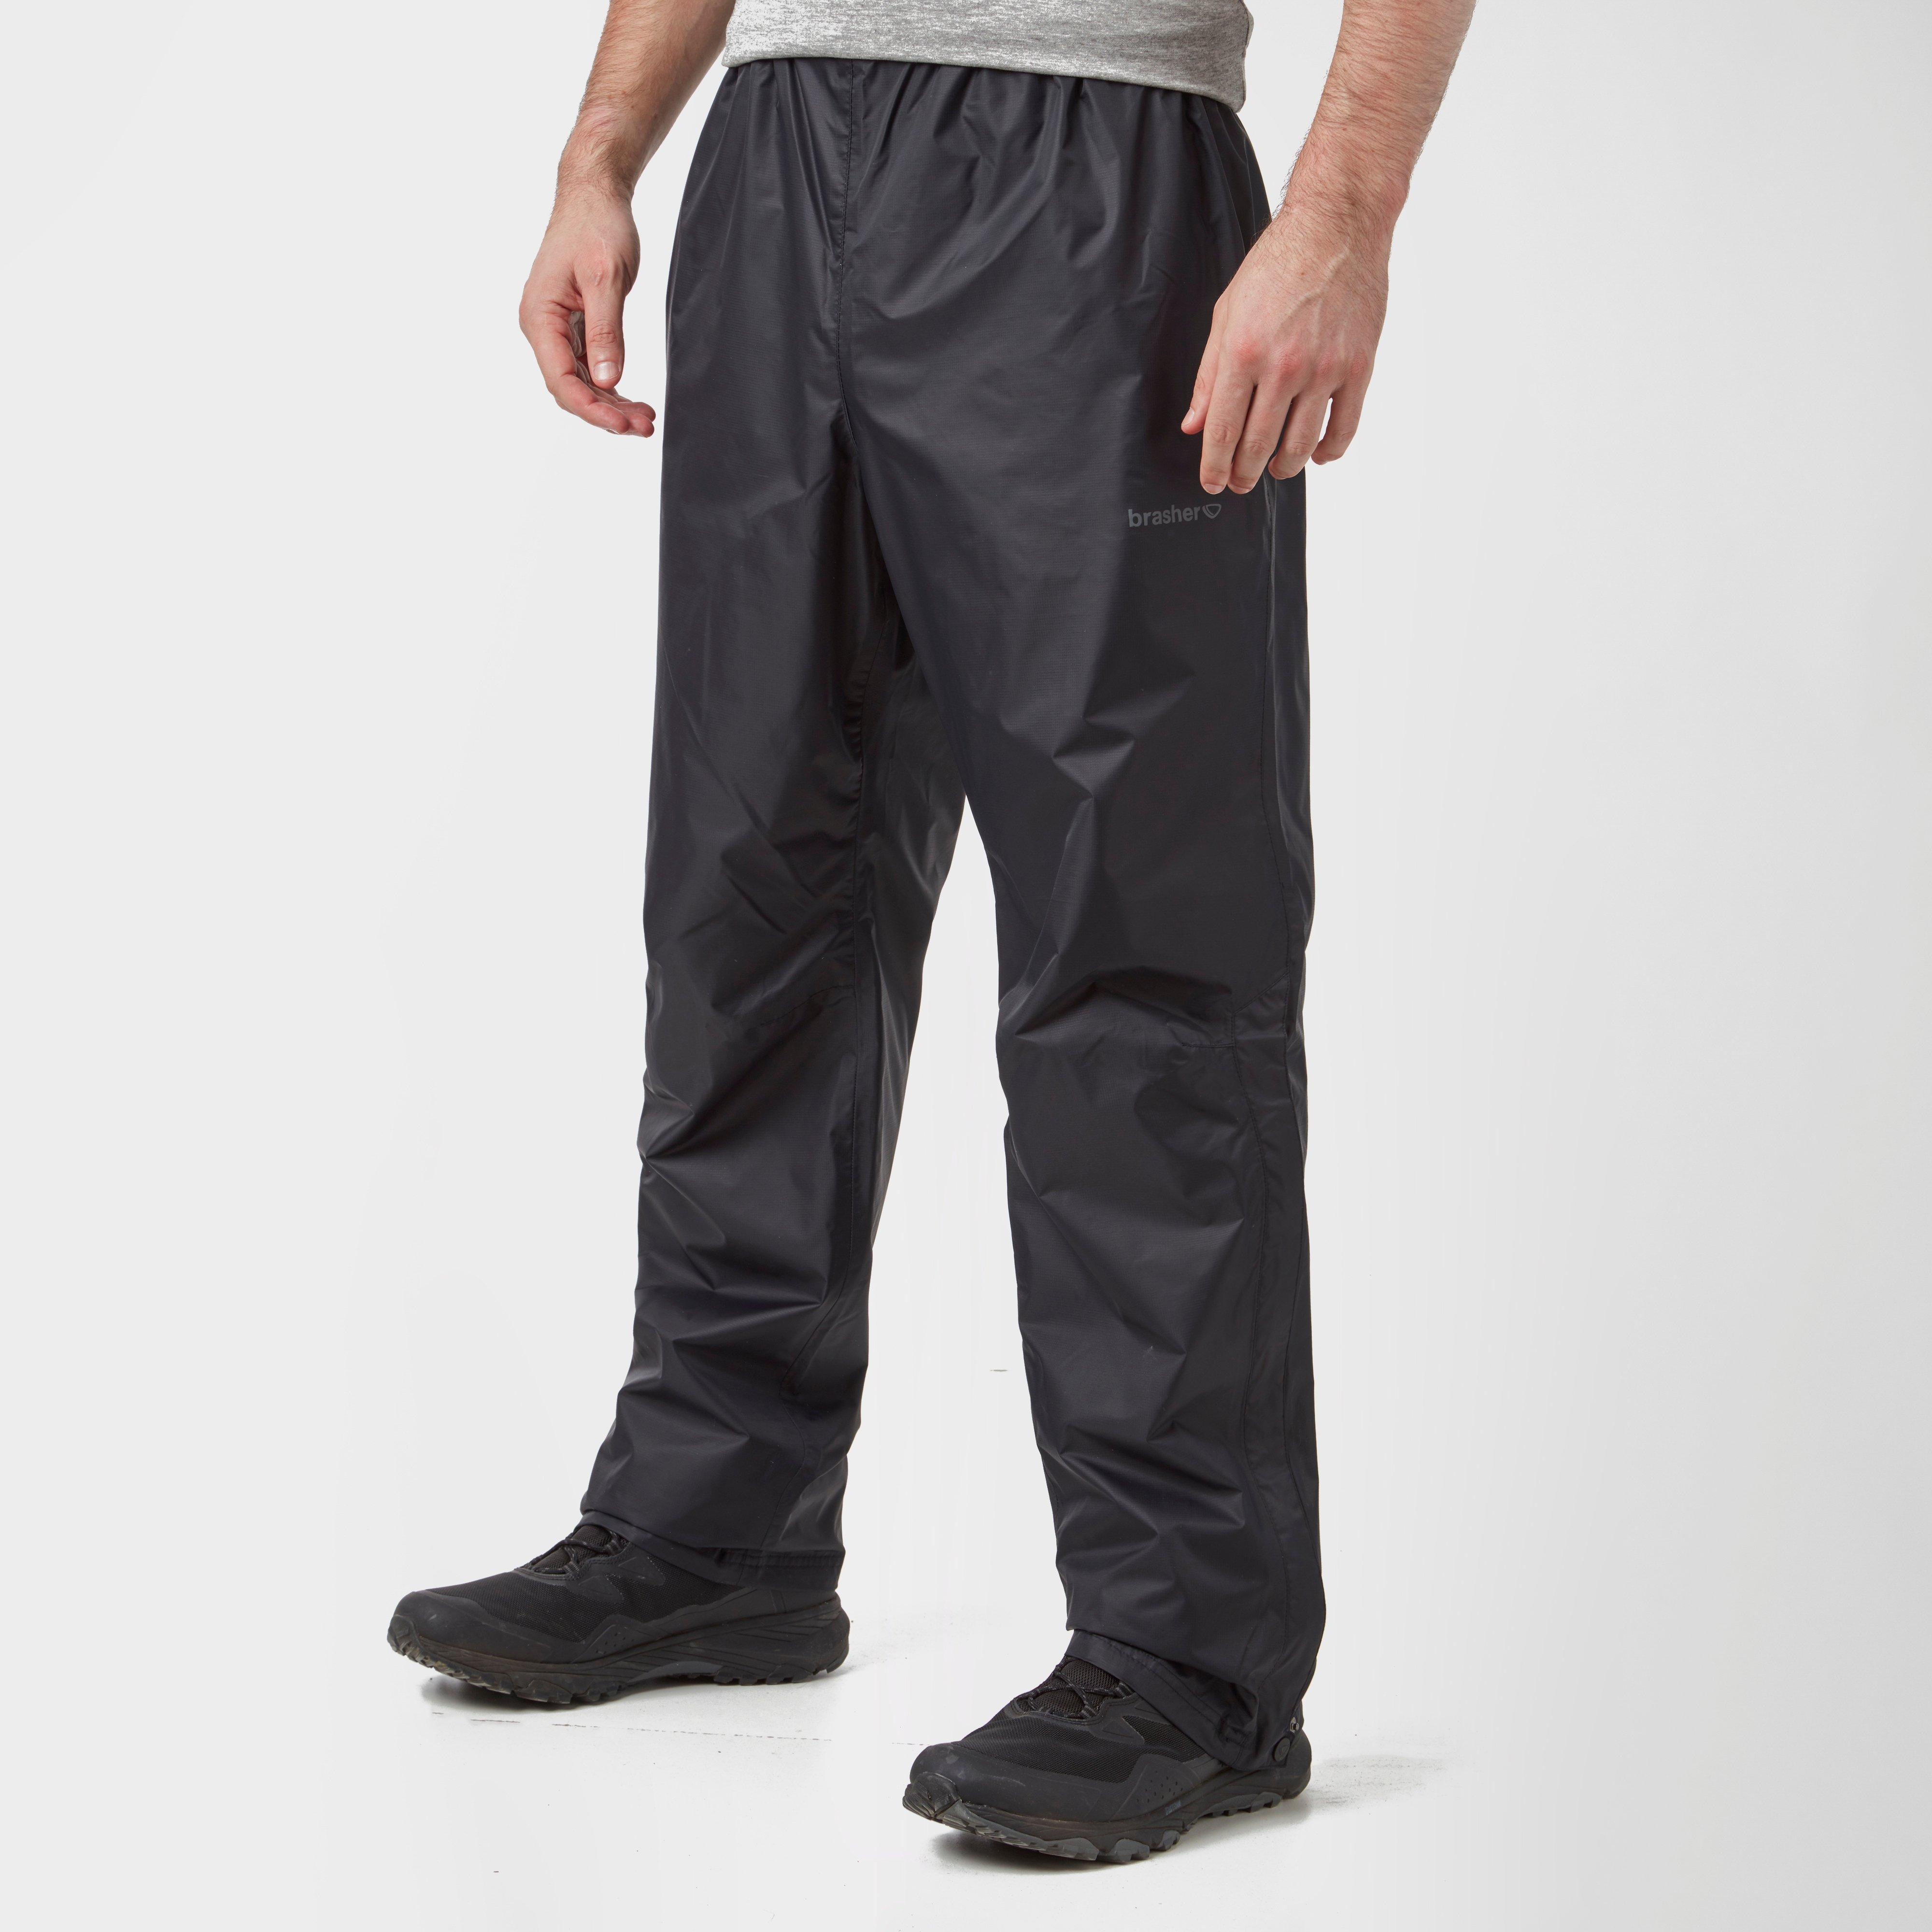 Brasher Mens Waterproof Overtrousers - Black/blk  Black/blk